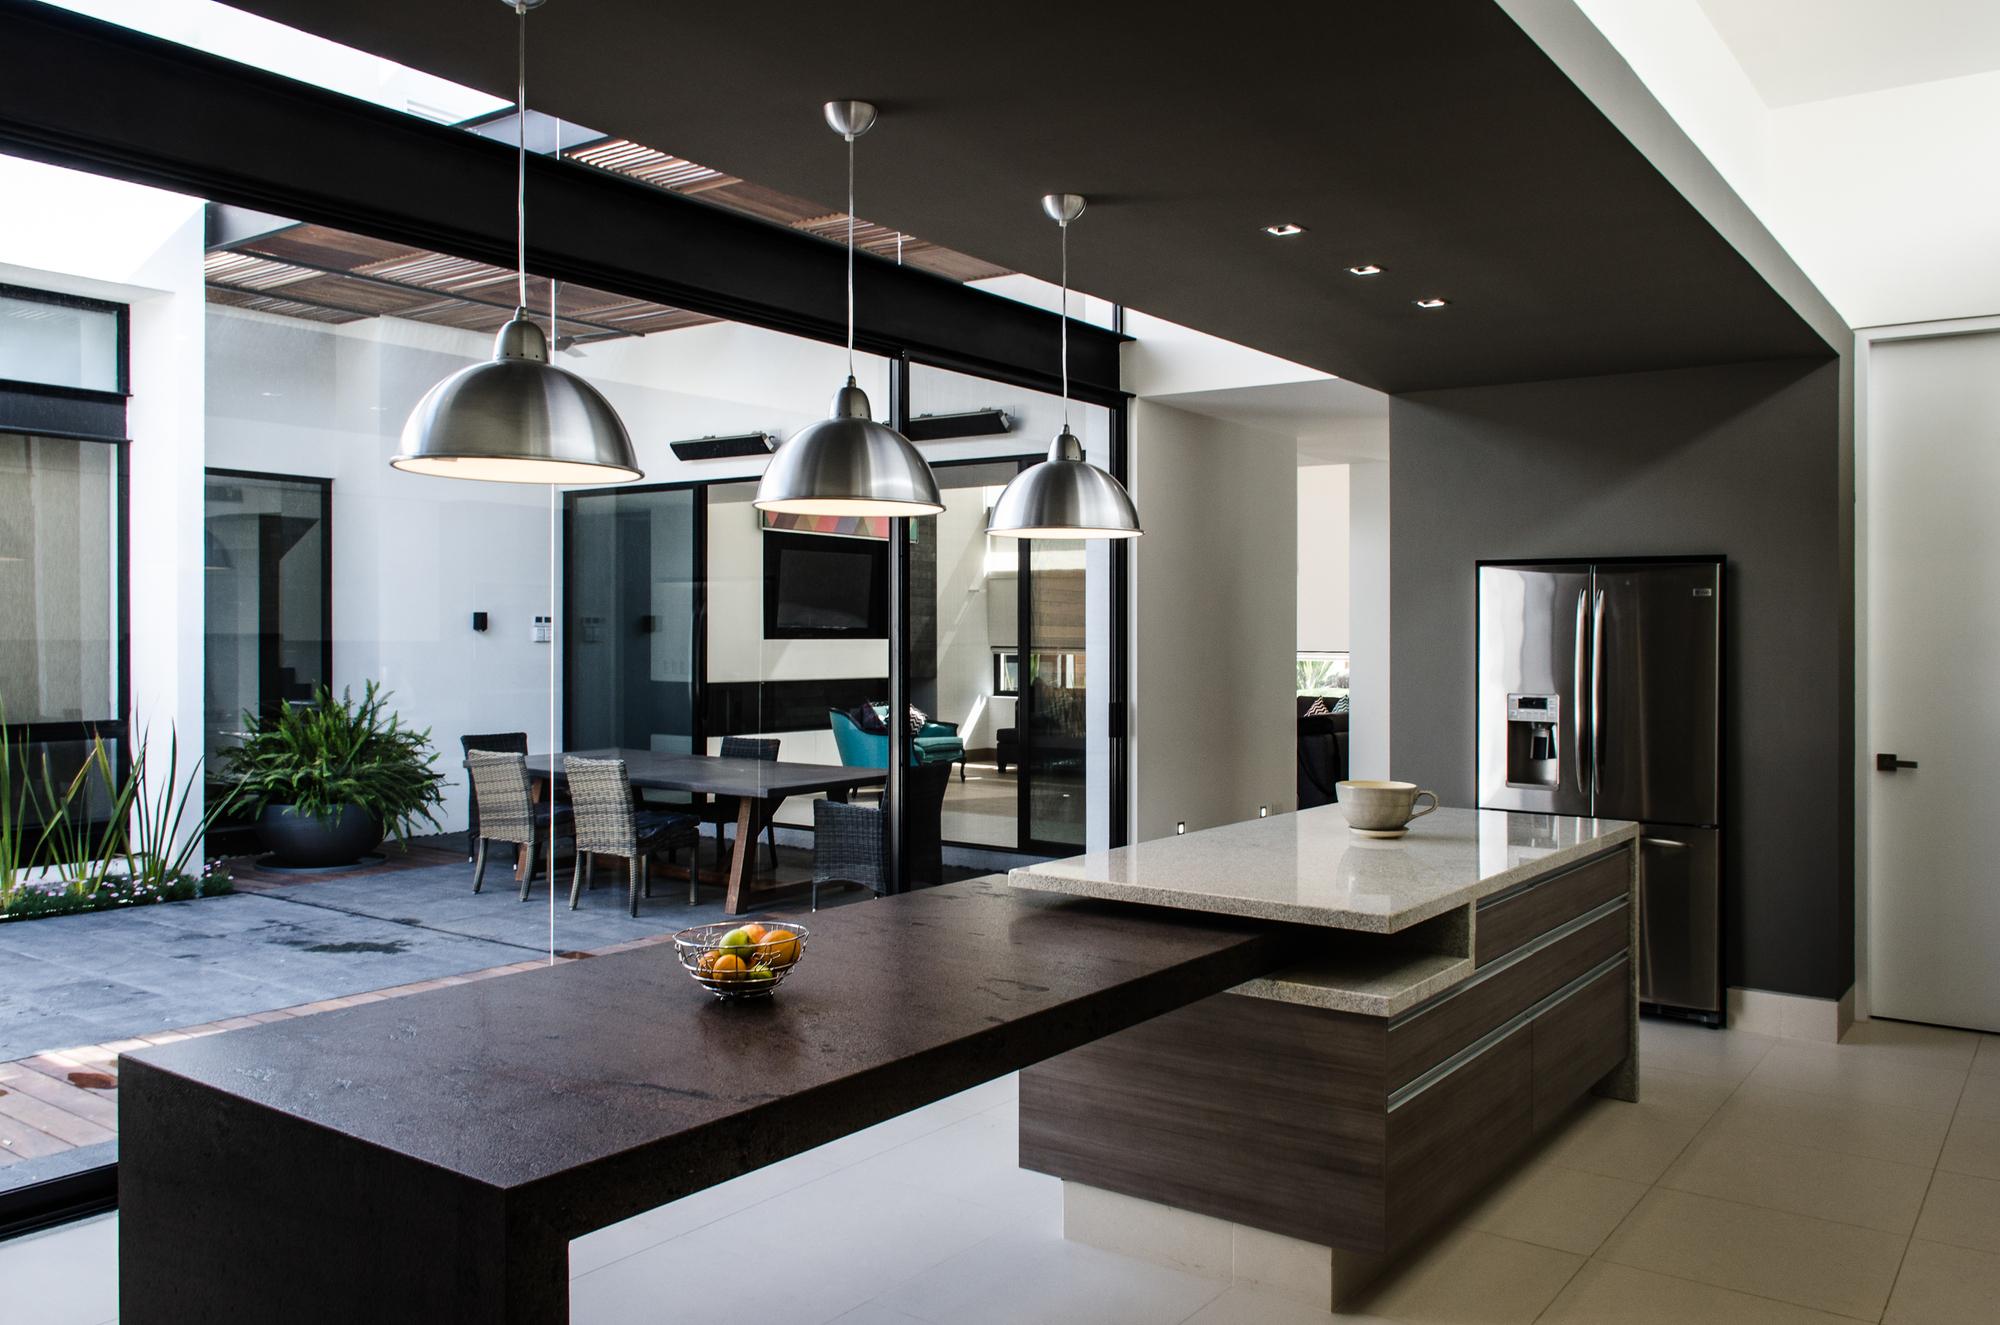 Galer a de casa agr adi arquitectura y dise o interior 17 - Arquitectura en diseno de interiores ...